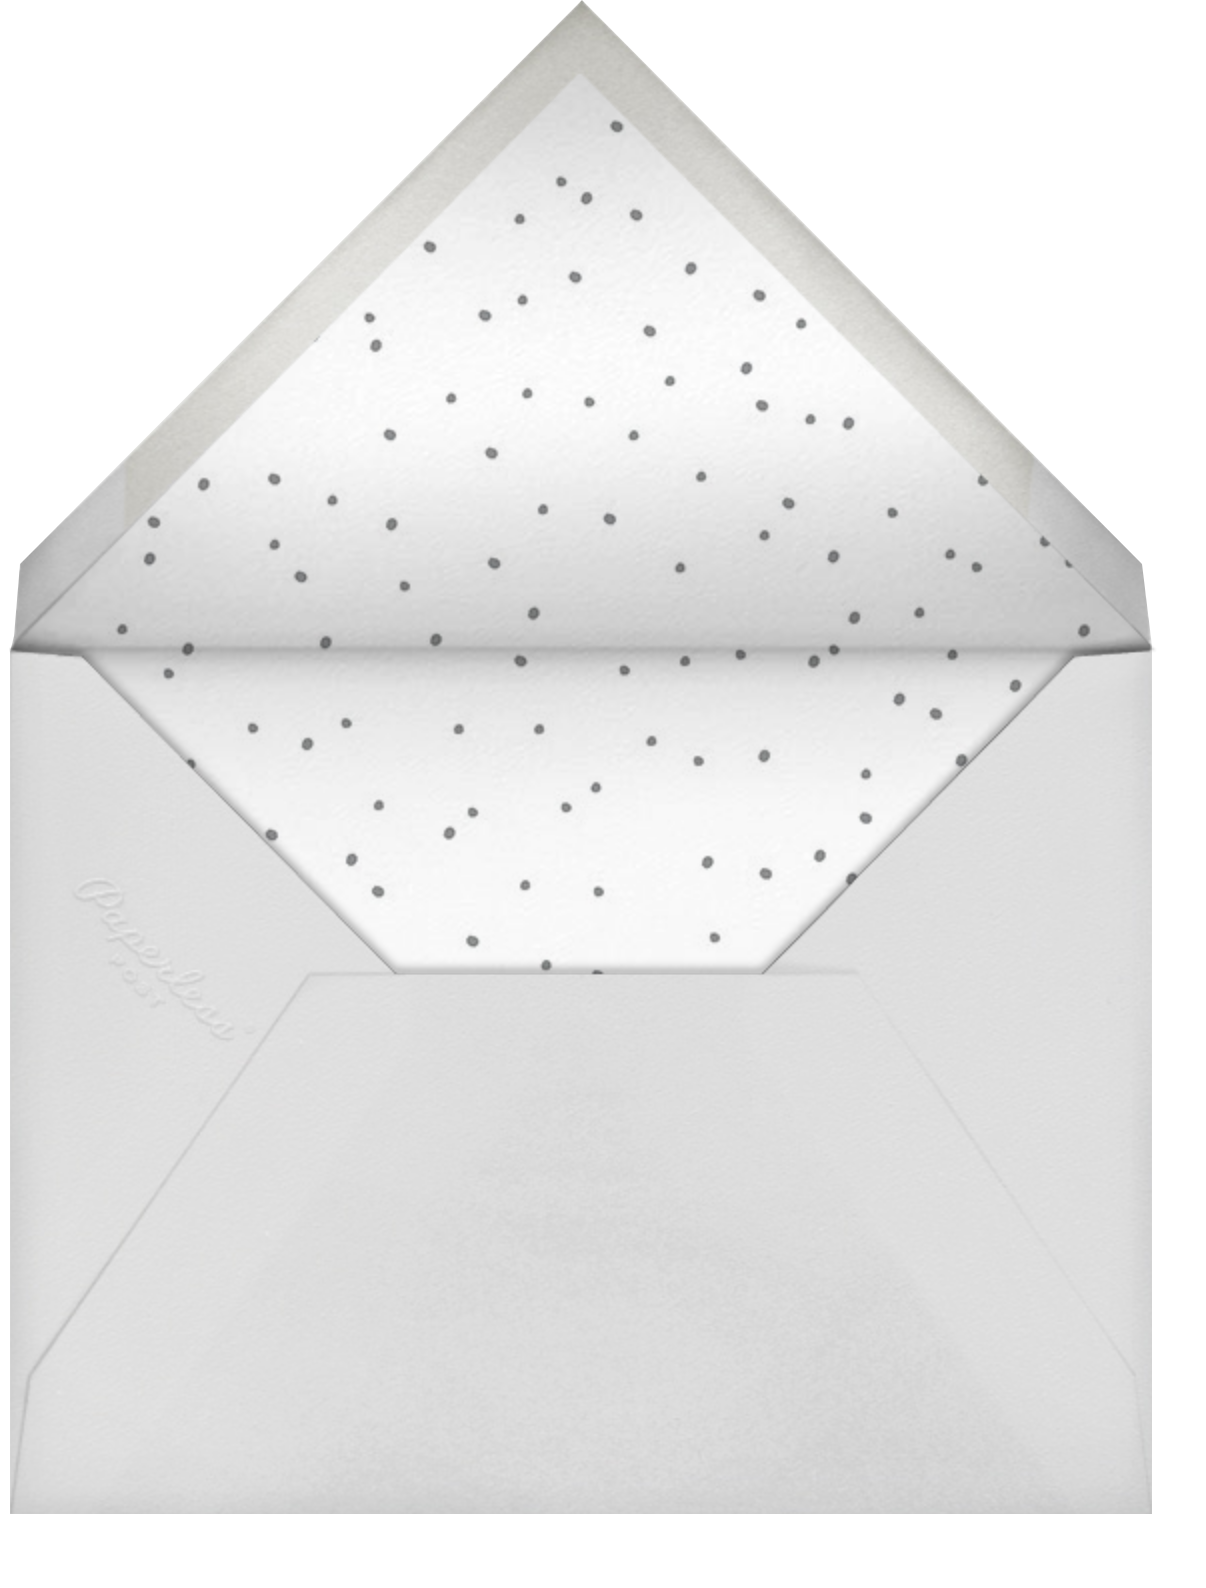 Mirabell (Invitation) - Blue - Linda and Harriett - All - envelope back